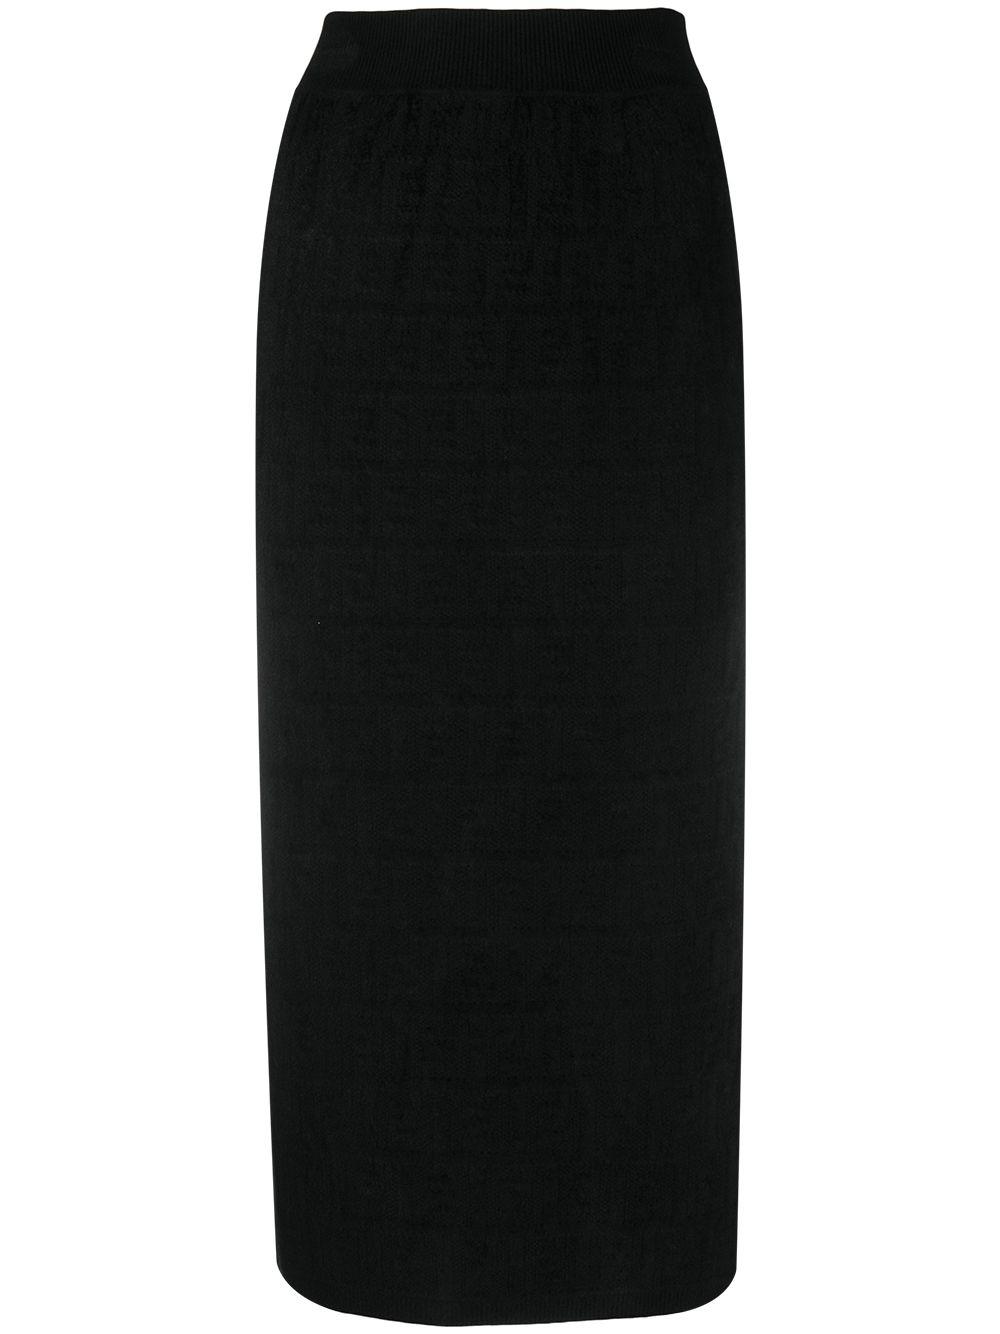 Fendi Skirts Black